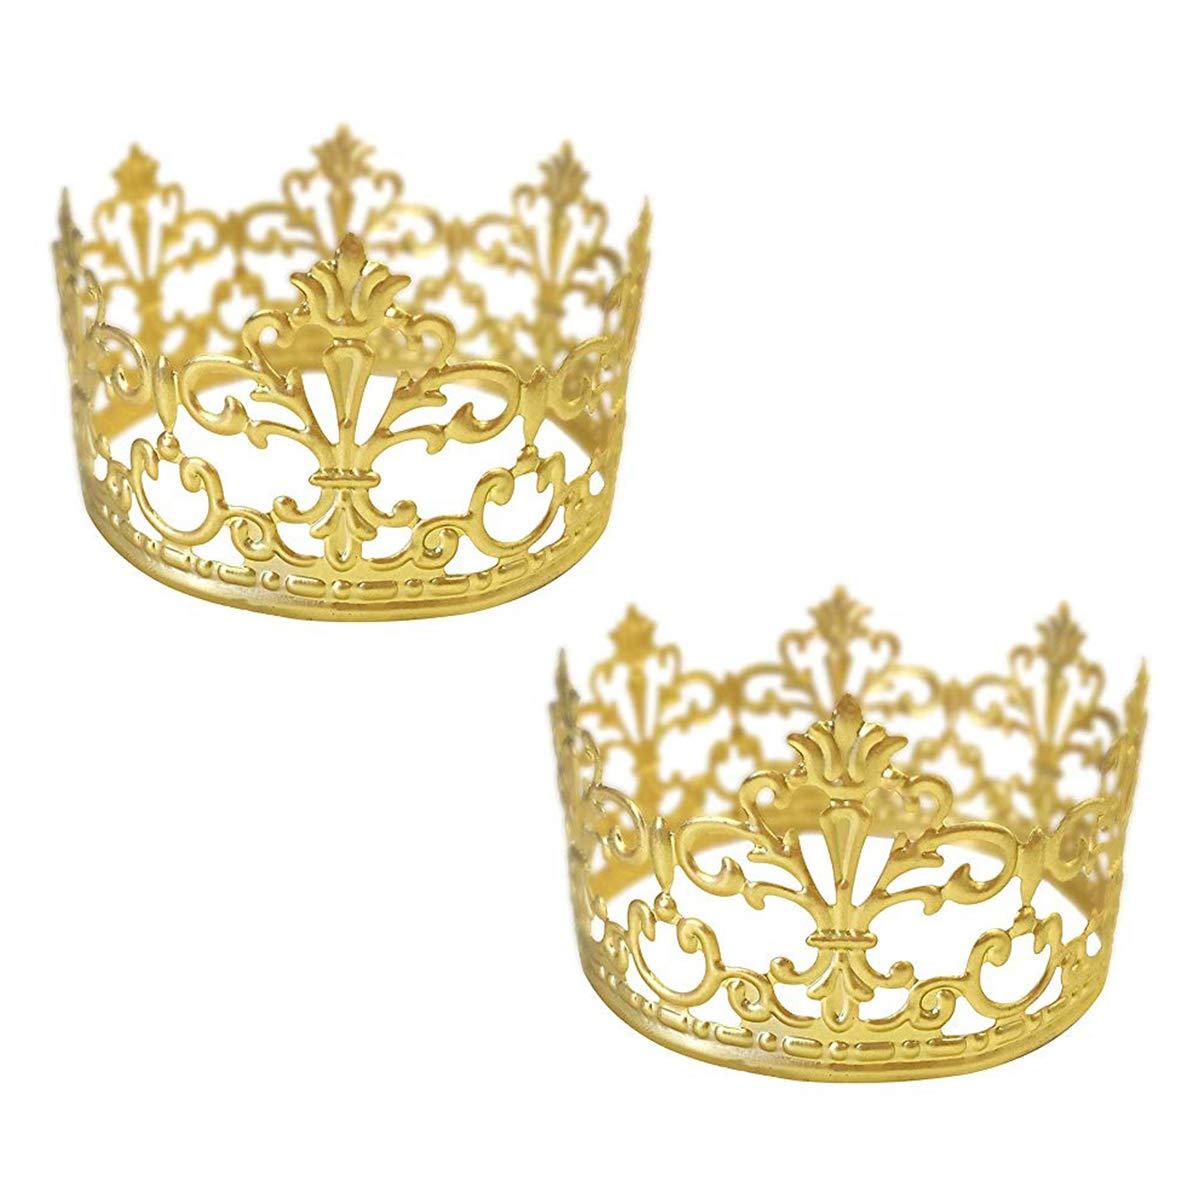 BESTONZON 2pcs Mini Cake Crown Topper/Princess Crown,Wedding Birthday Party Decoration(Gold)